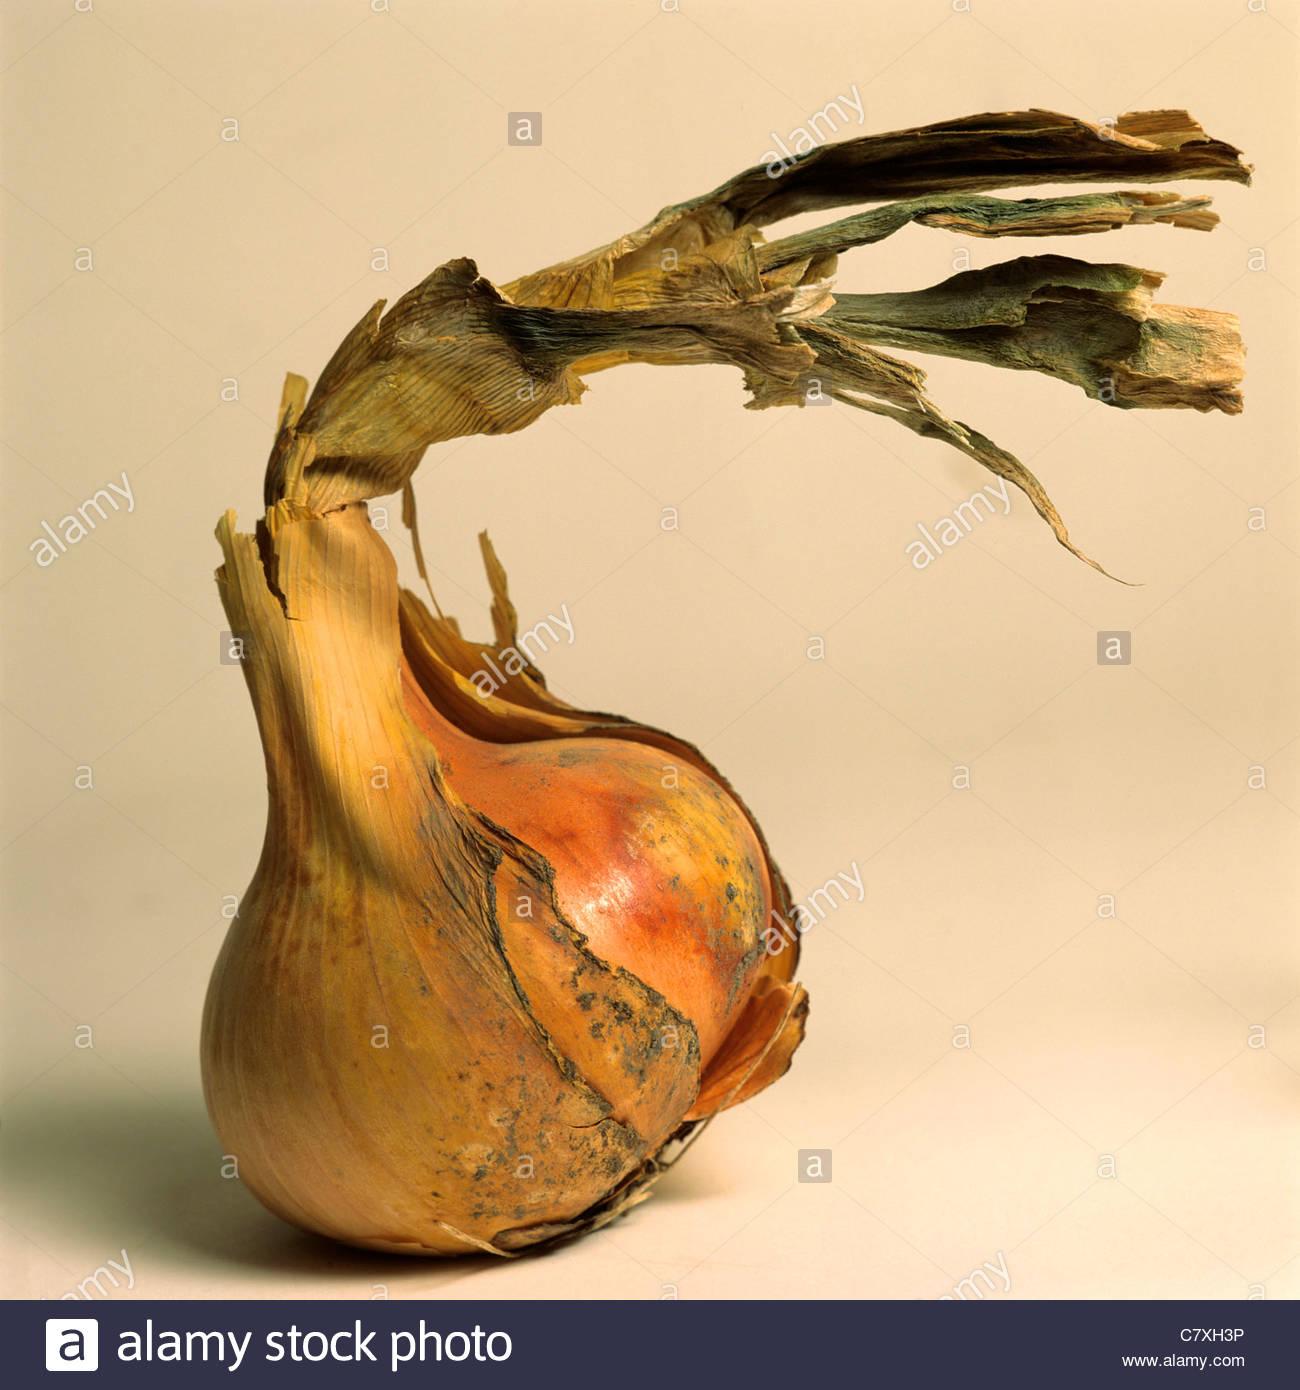 Zwiebel mit peeling Haut Stockfoto